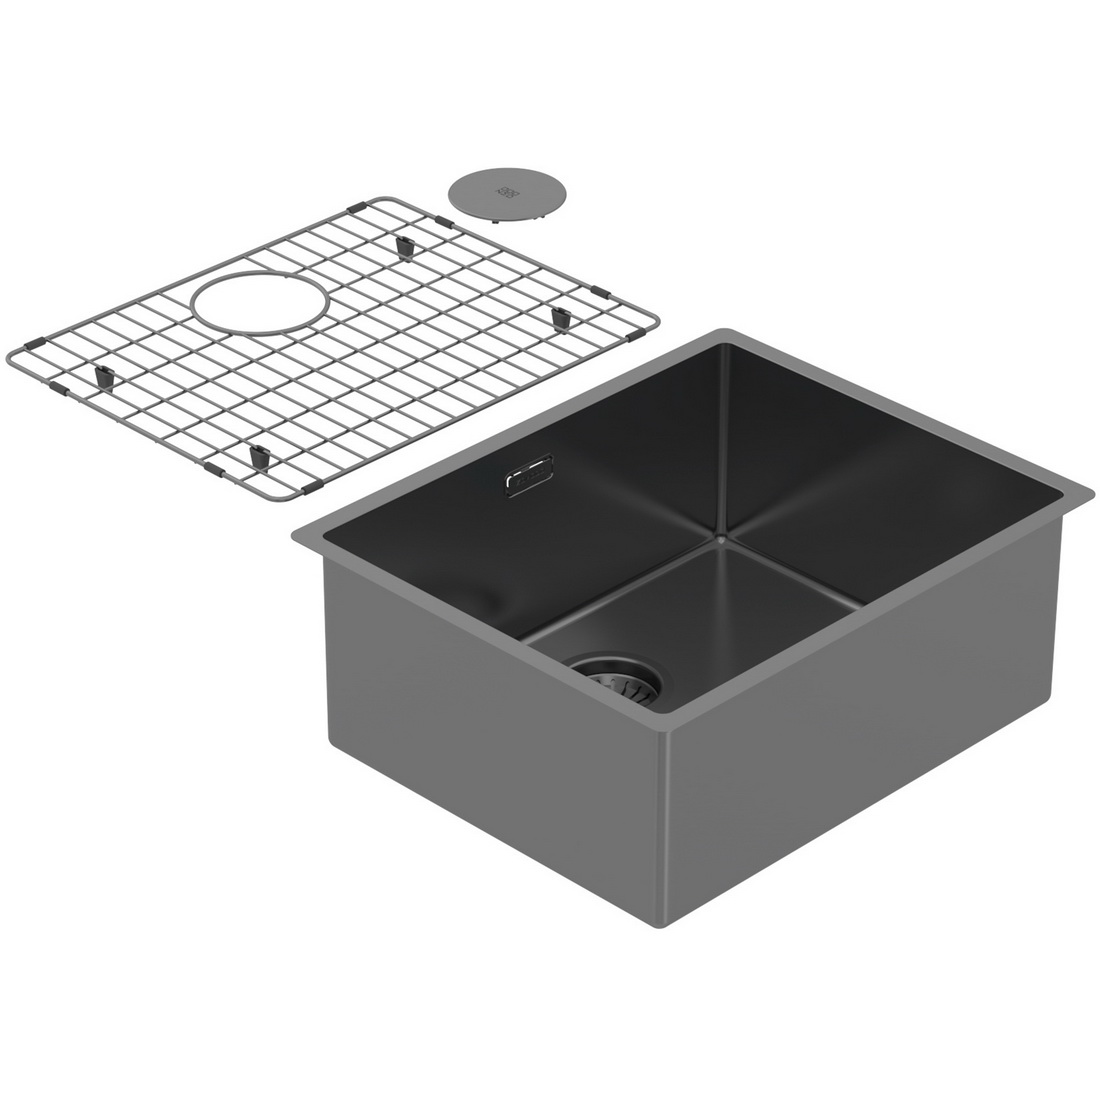 540x440x210mm Single Large Bowl Undermount Kitchen Sink Cayman Black PearlArc Finish